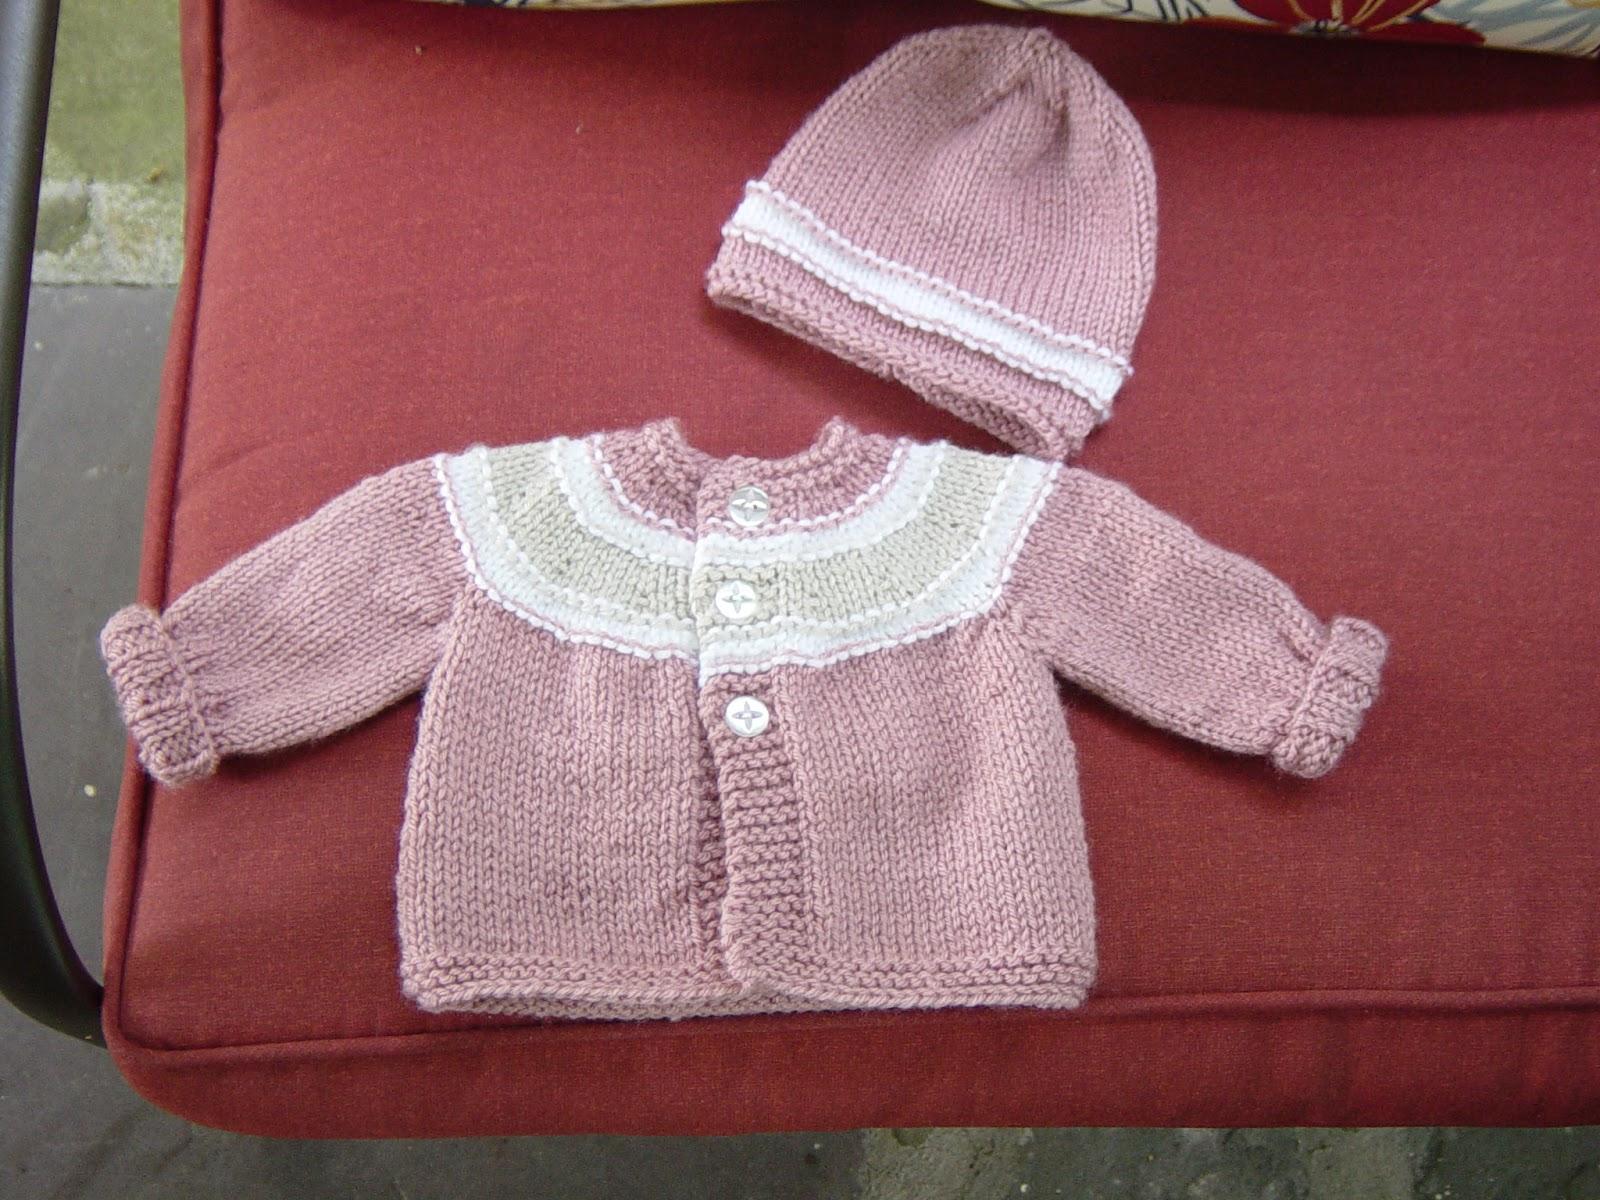 Fingerless gloves darn yarn - It Was Knit From Vanna S Choice Yarn I Find The Vanna S Choice To Be A Nice Acrylic Yarn To Use